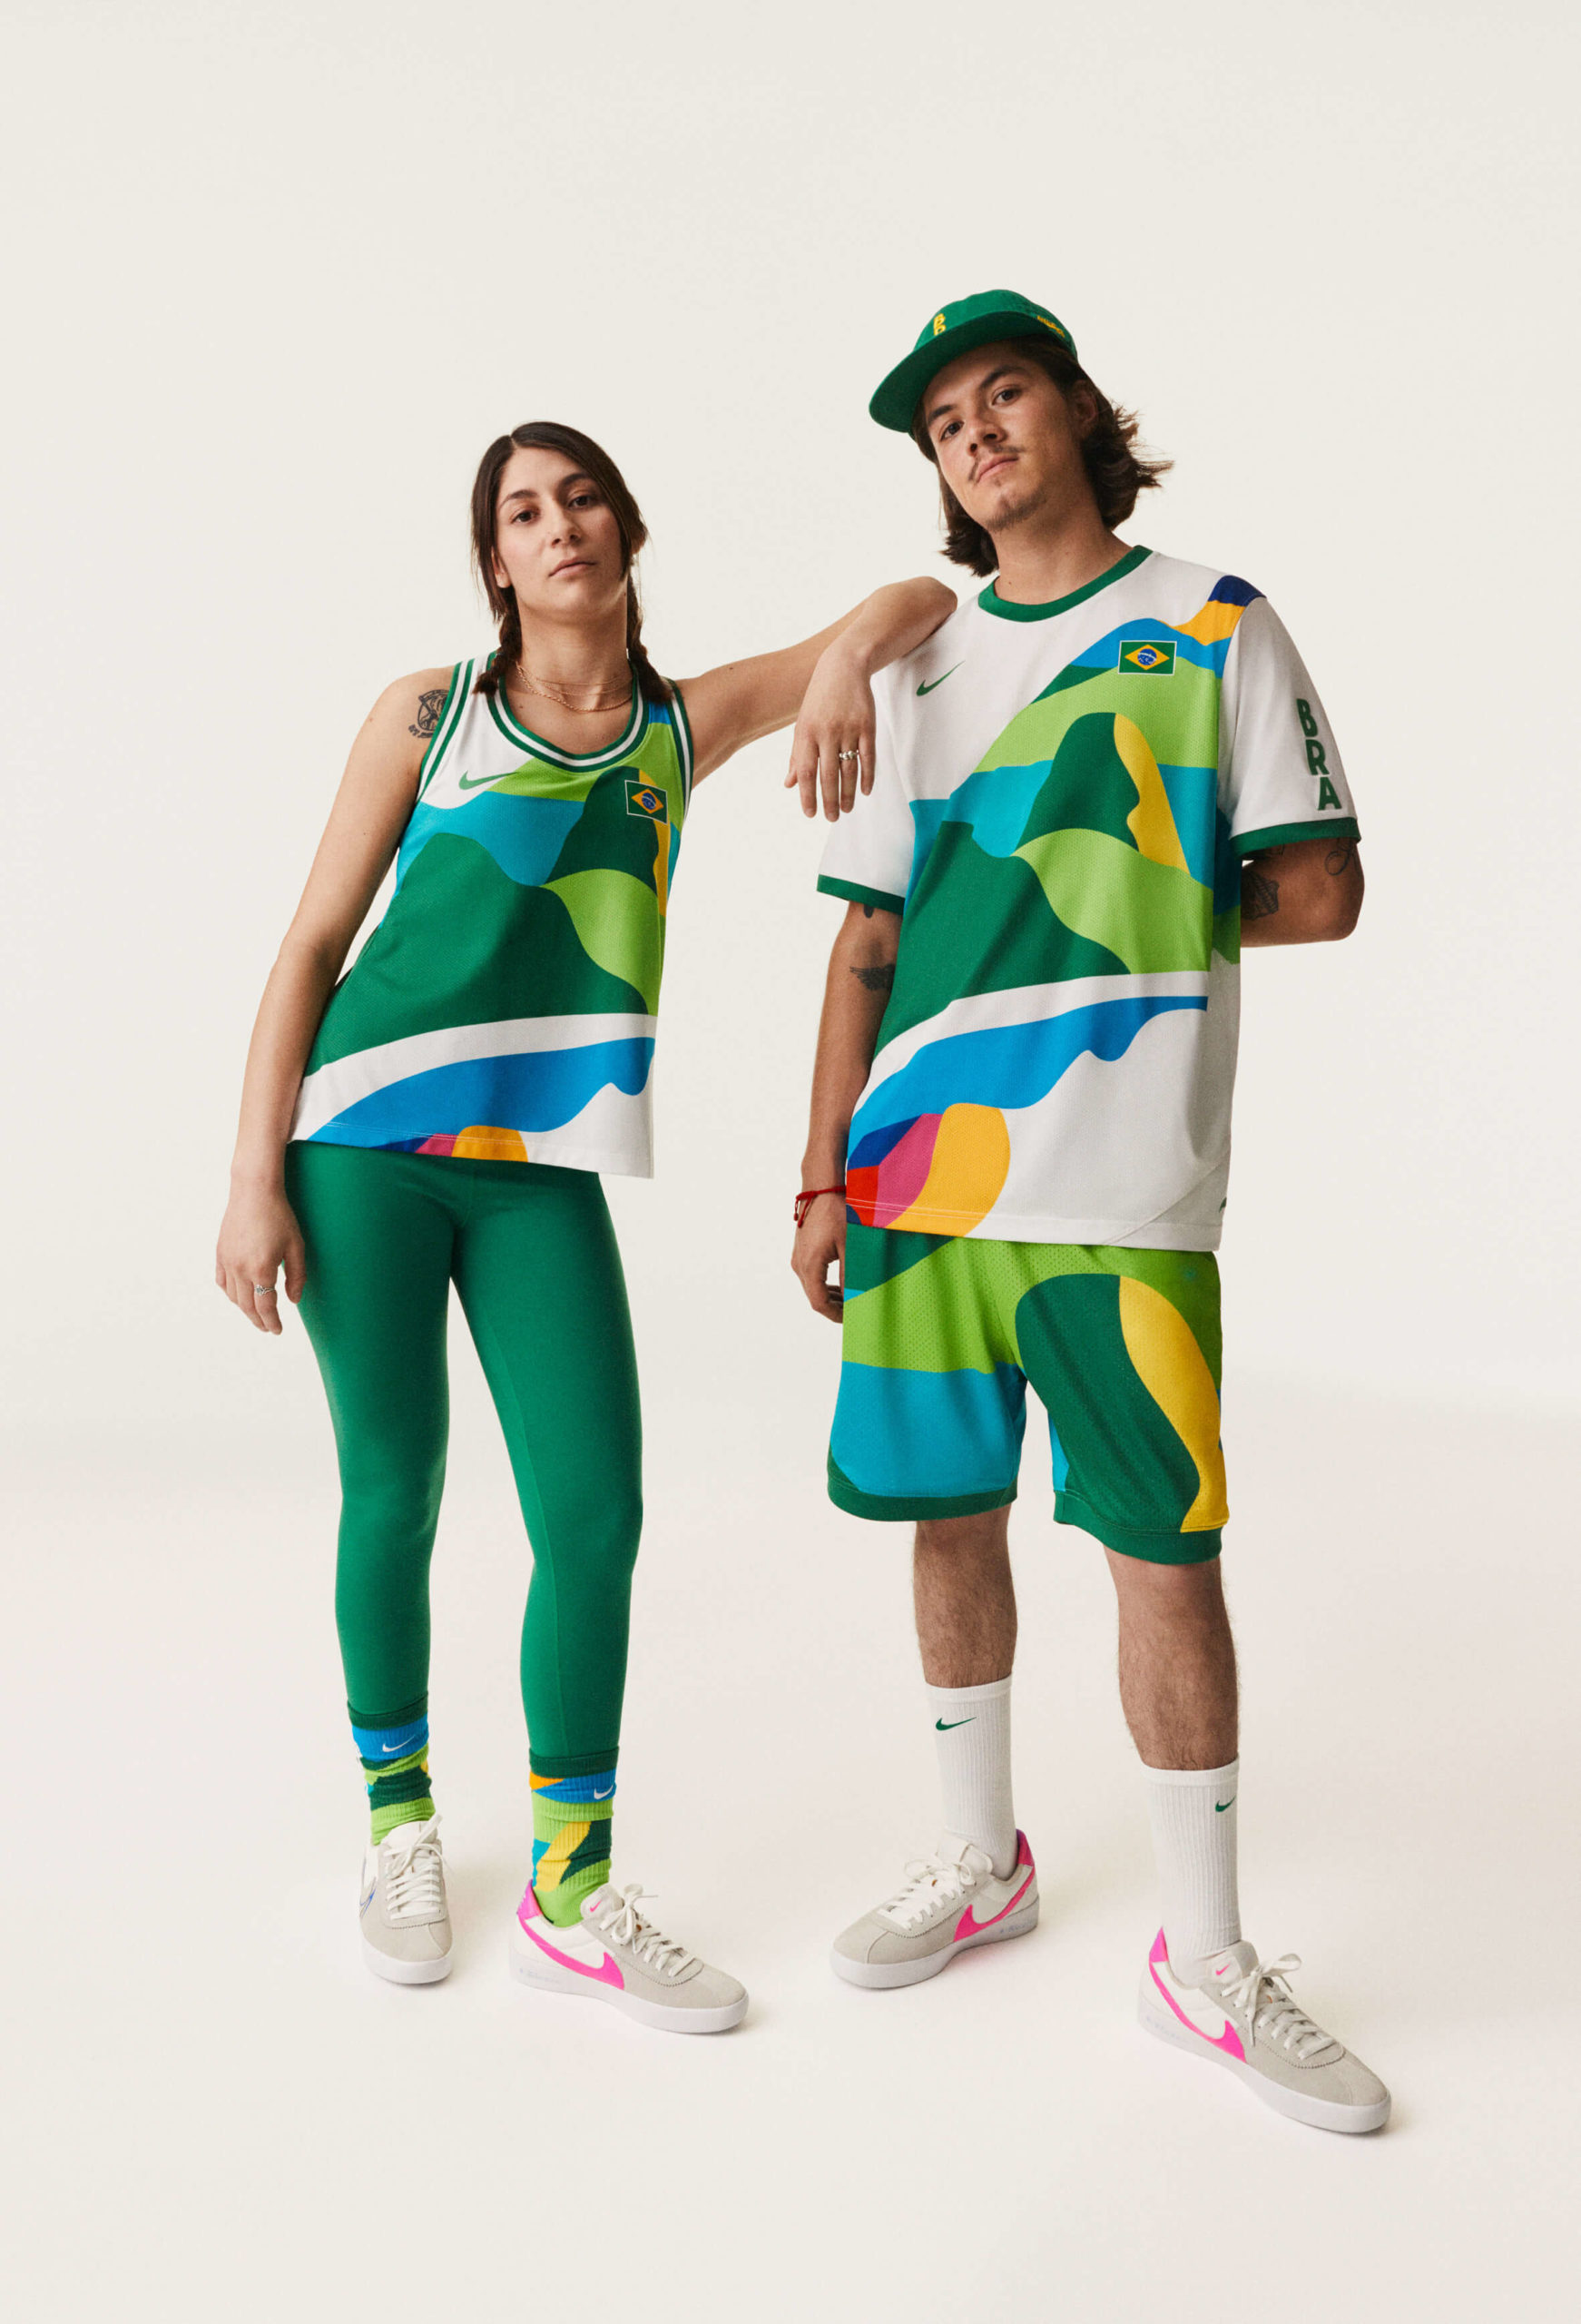 nike strój brazylia